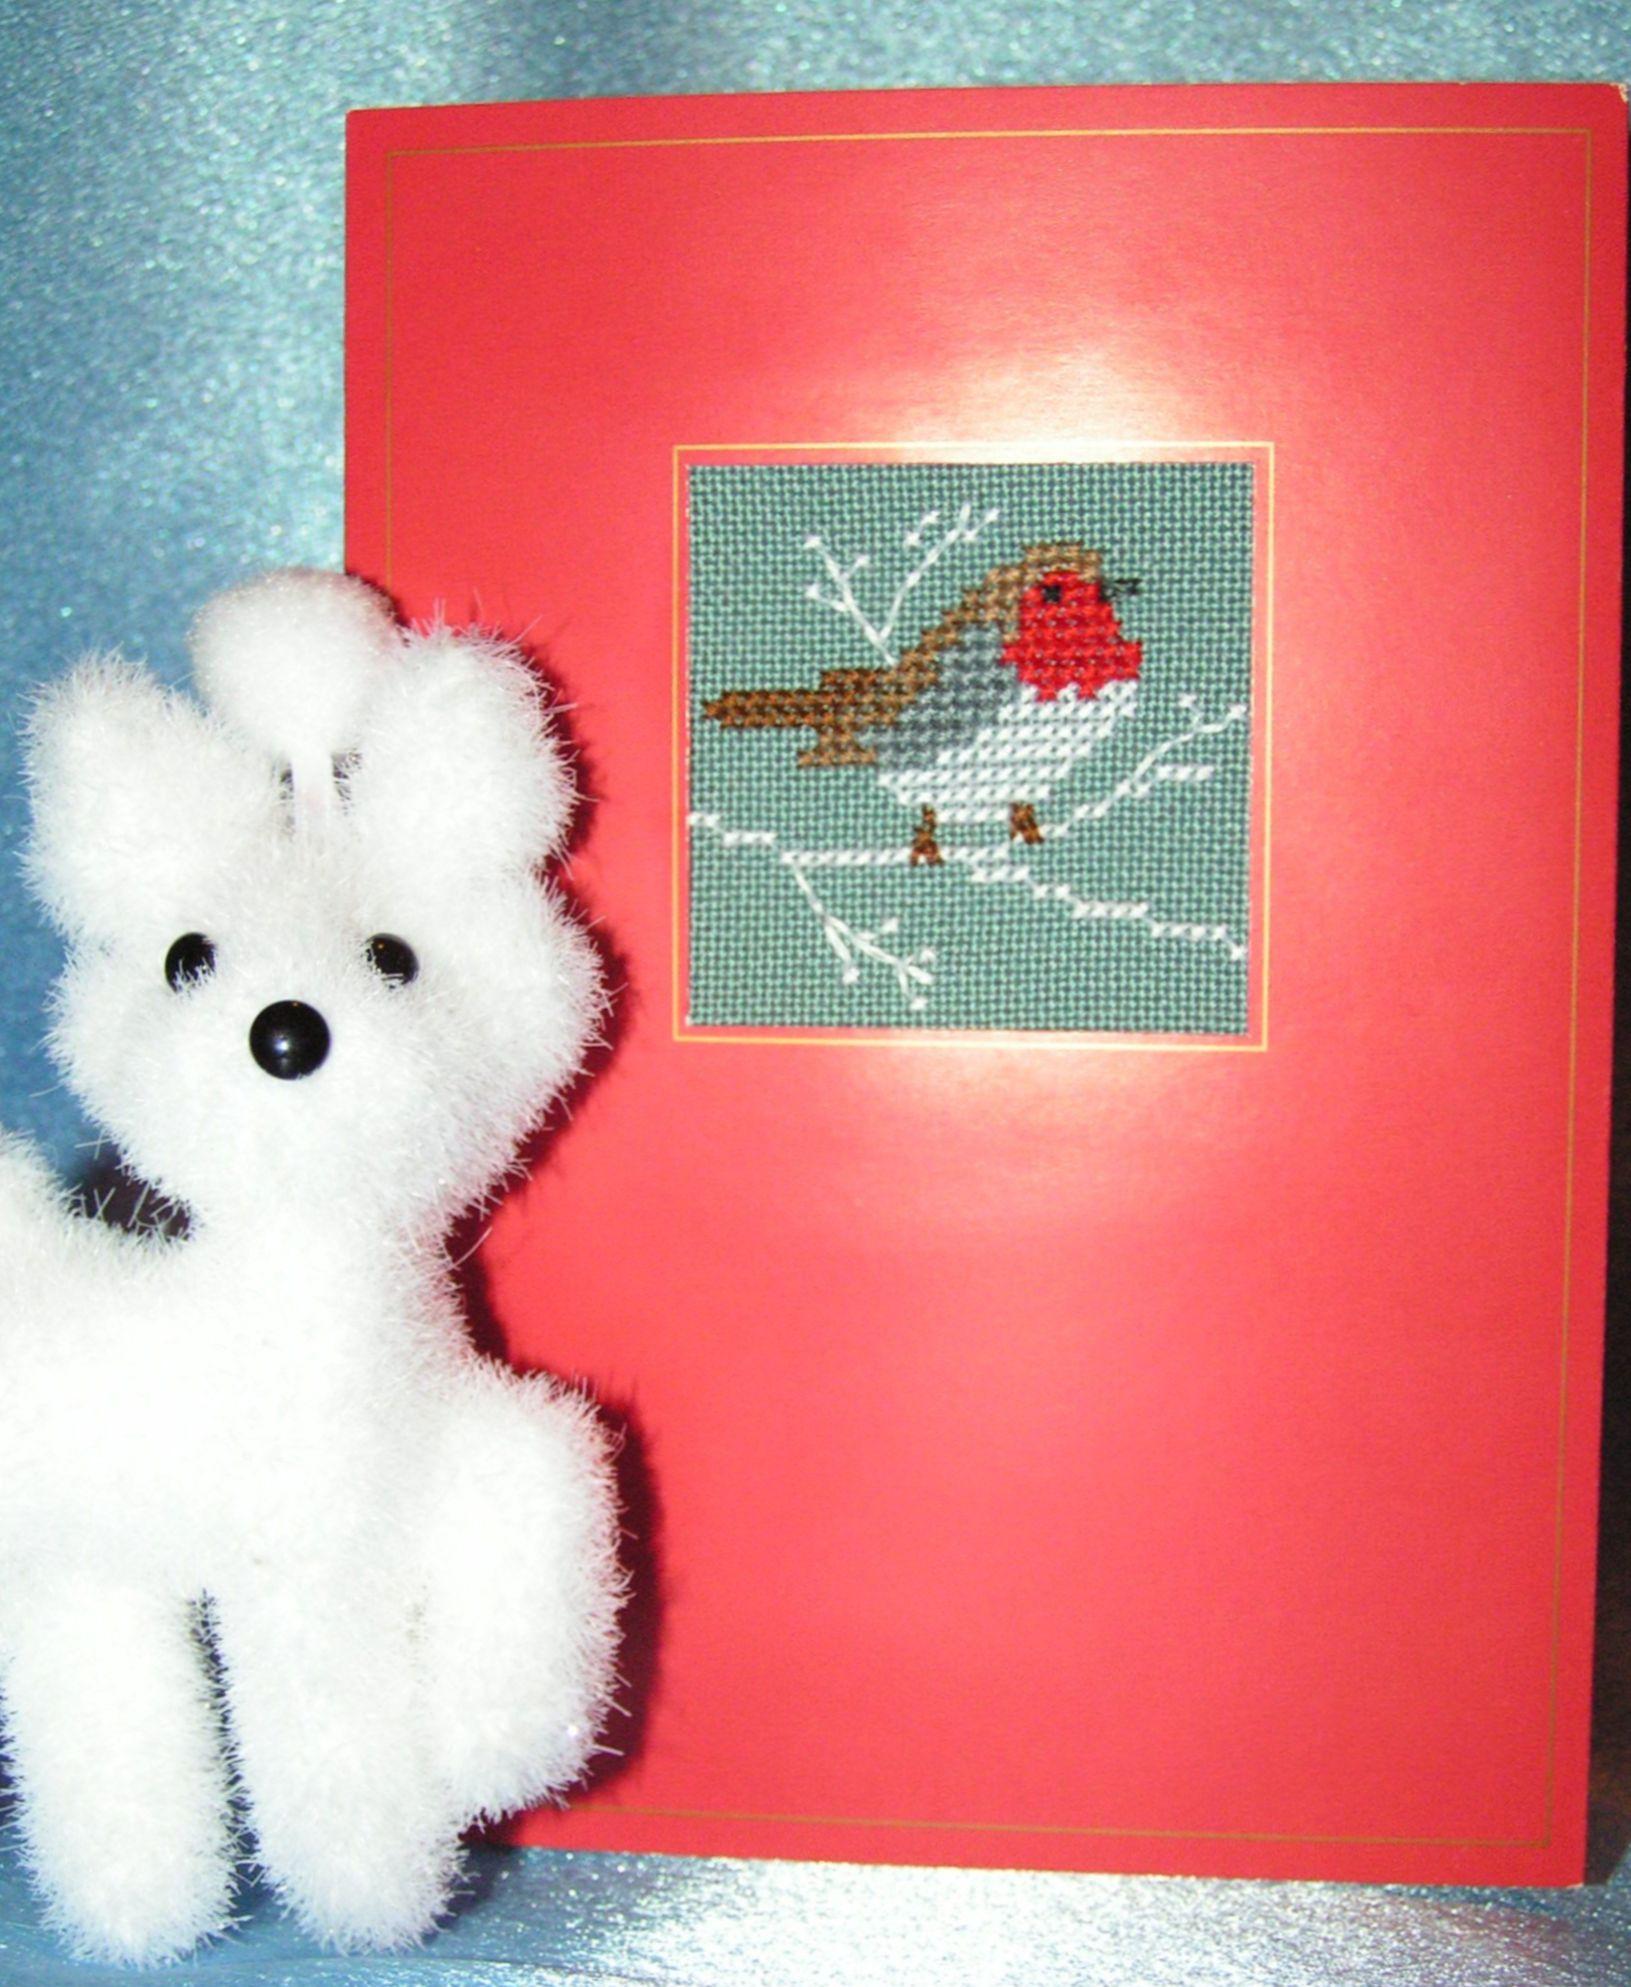 11 - NATASHKA и мальчишки. 2012 Проект Зимняя открытка